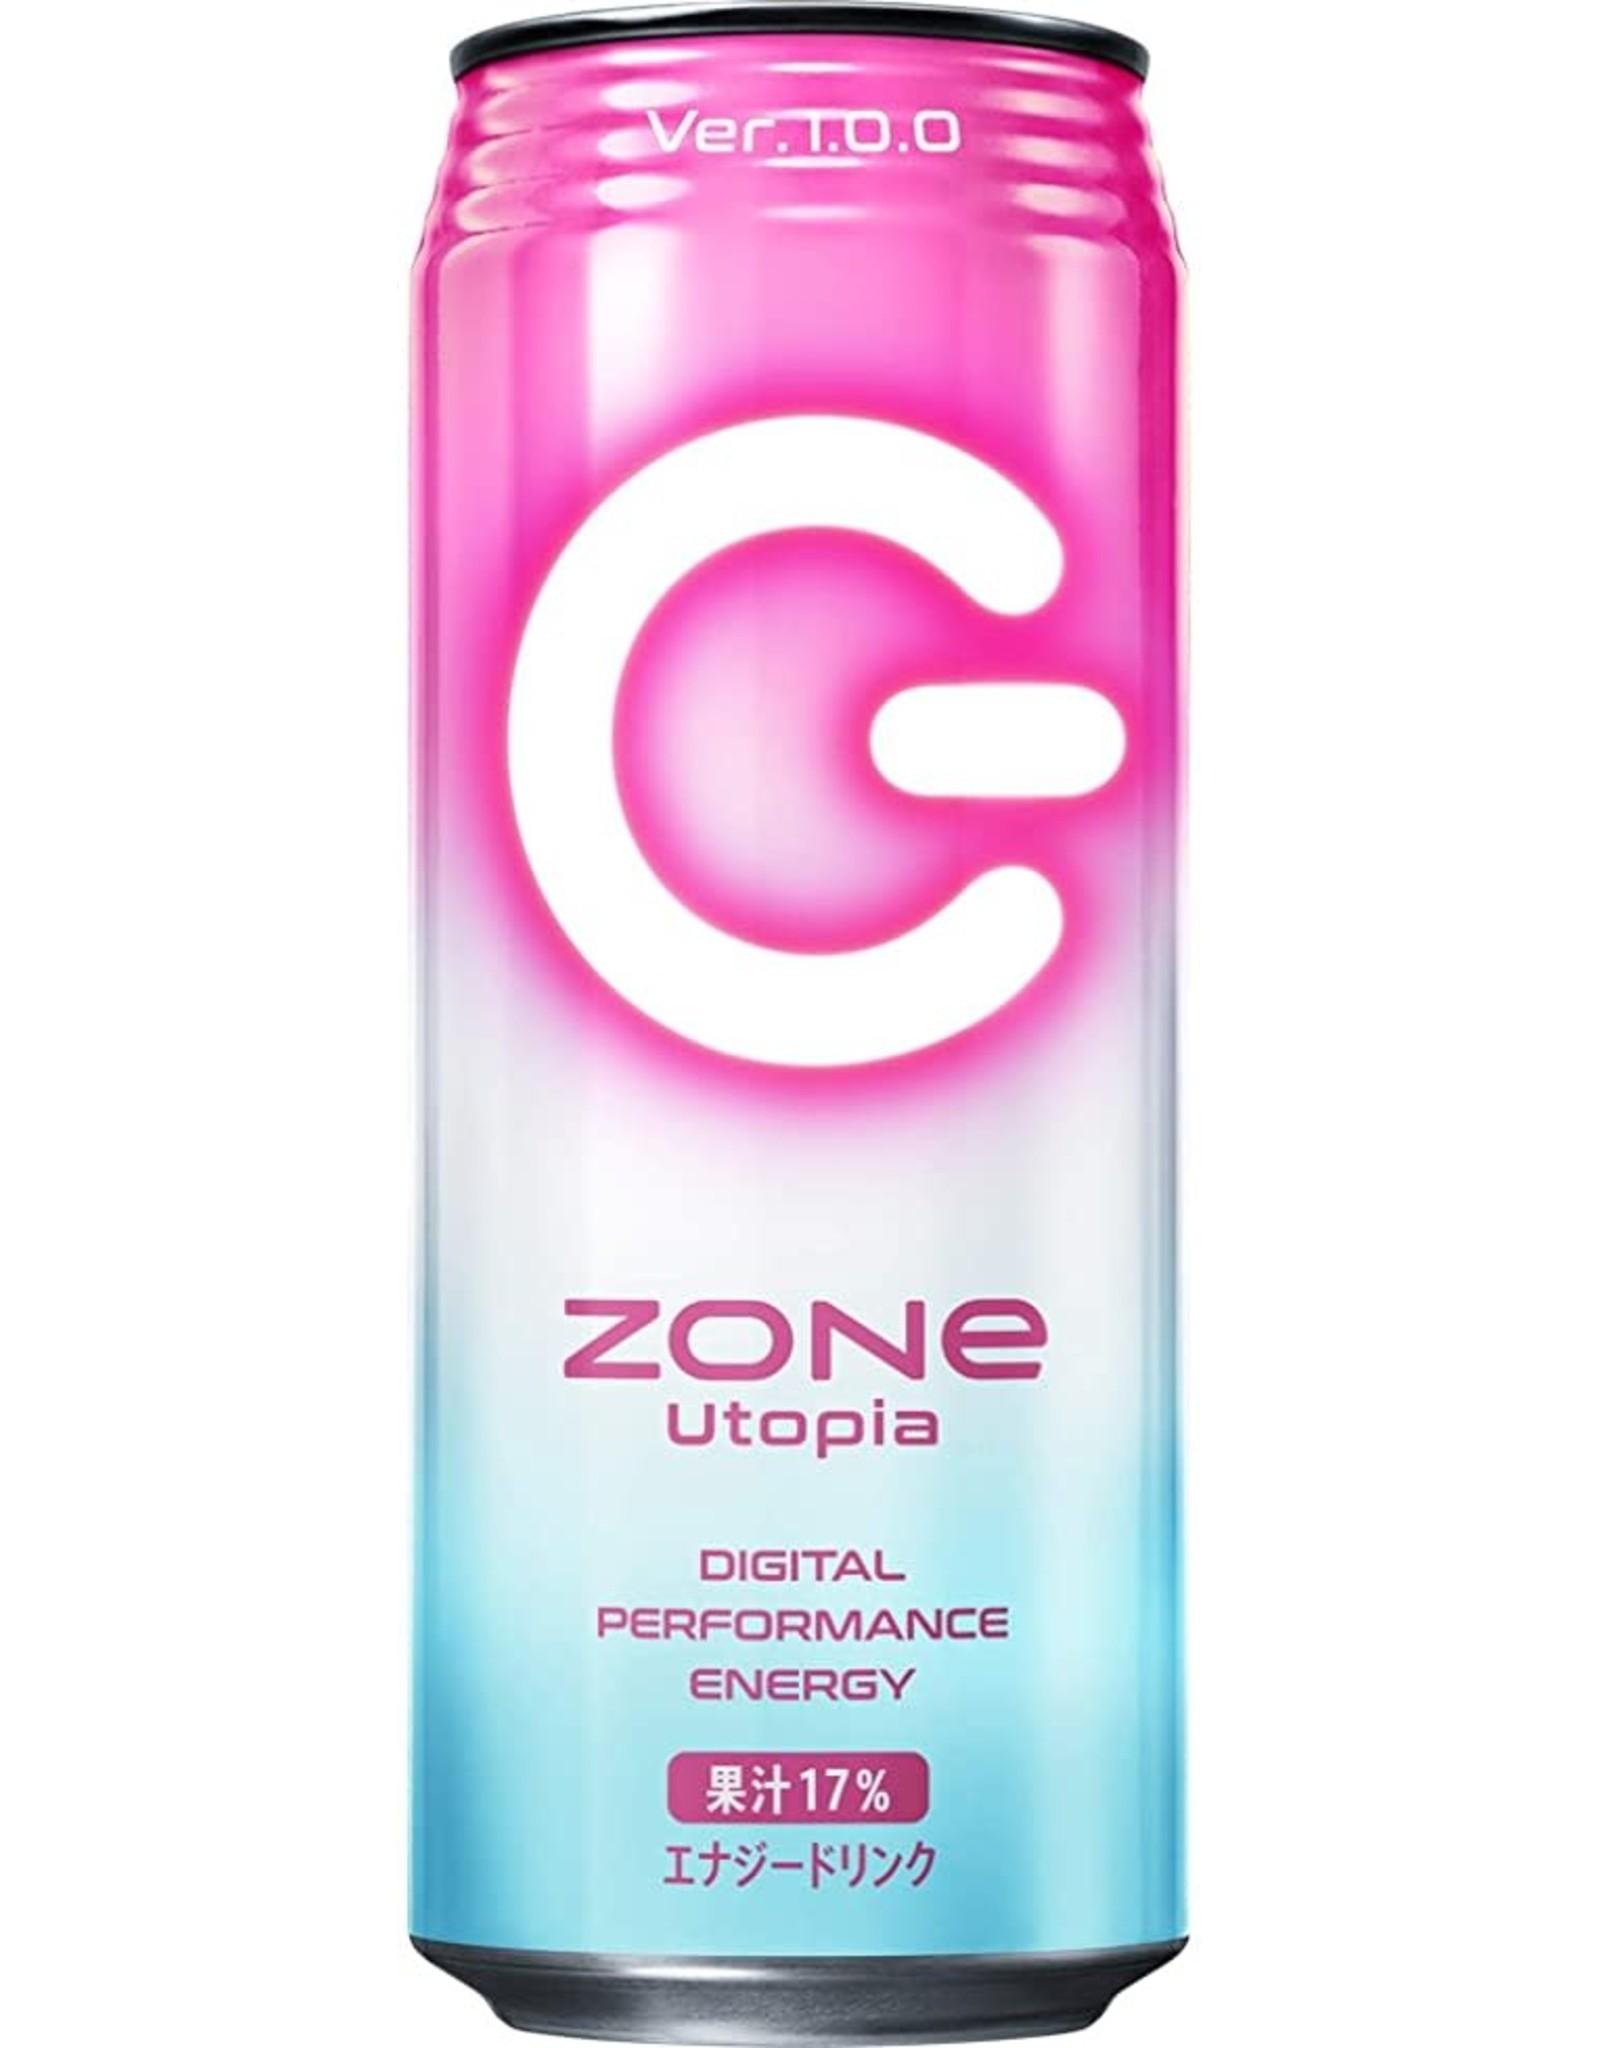 Zone Utopia: Digital Performance Energy Drink Ver. 1.0.0. - 500 ml